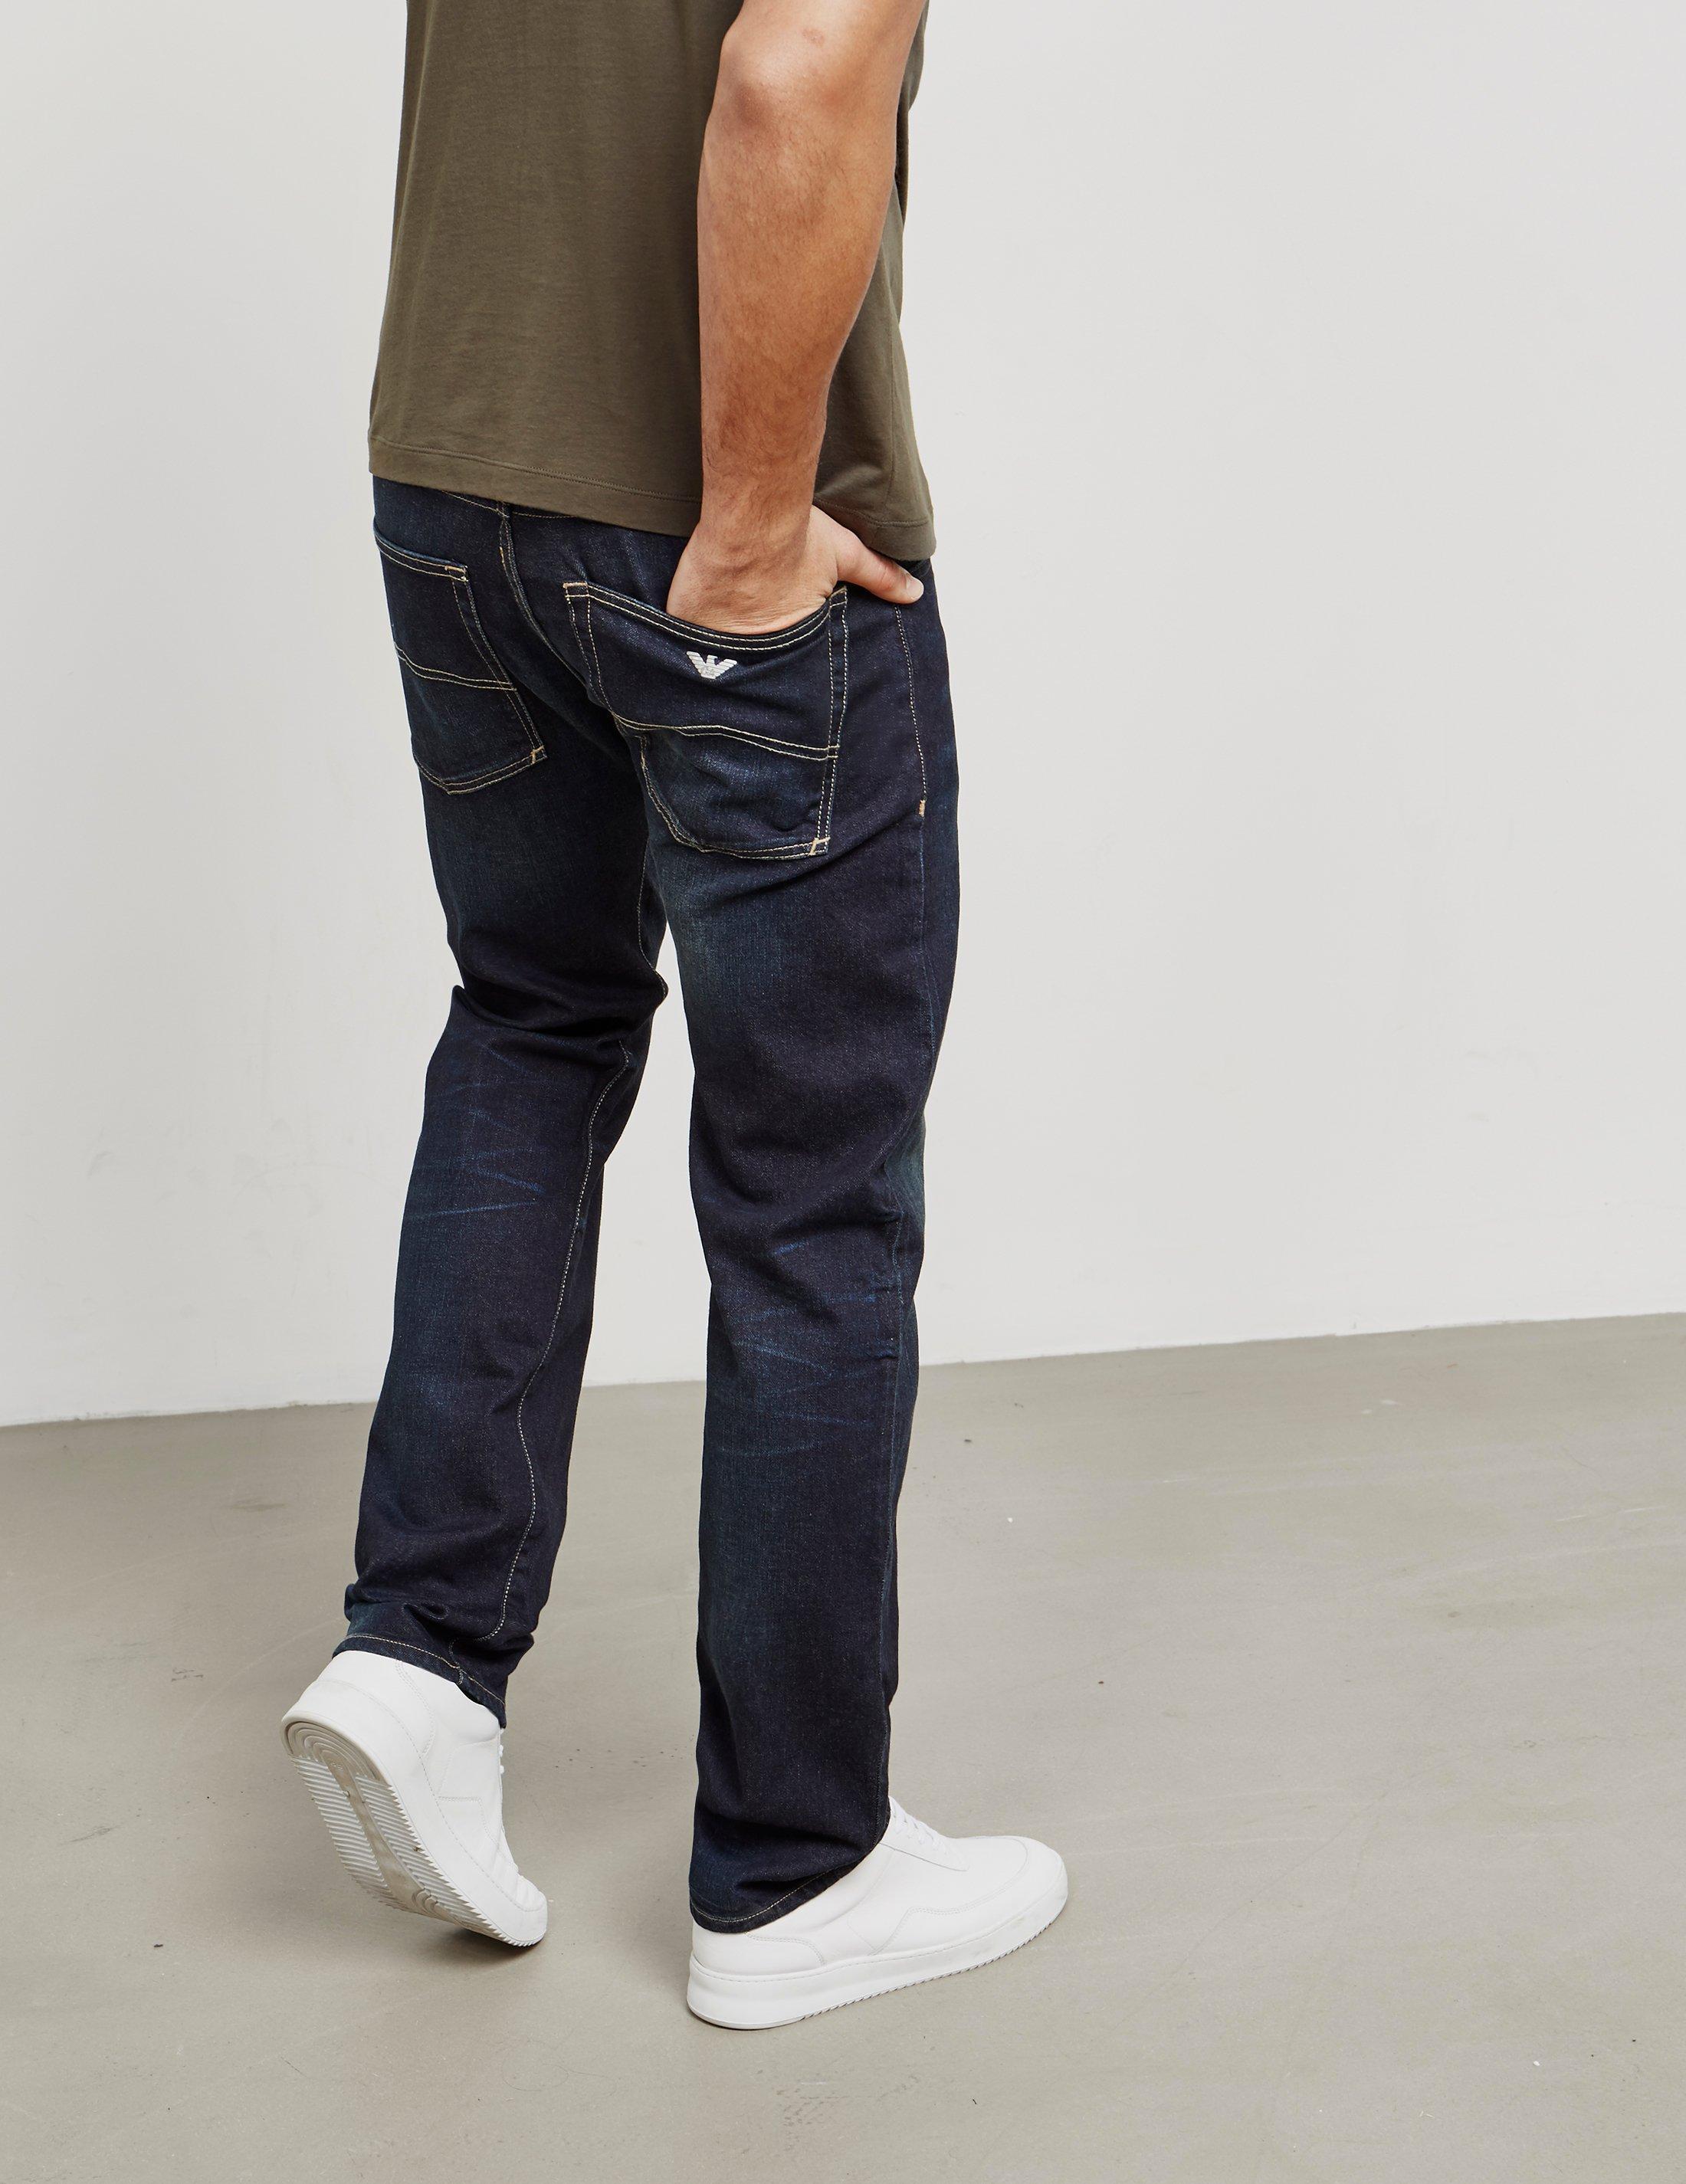 b01bf700 Armani Jeans Mens J45 Slim Fit Jeans Blue for Men - Lyst